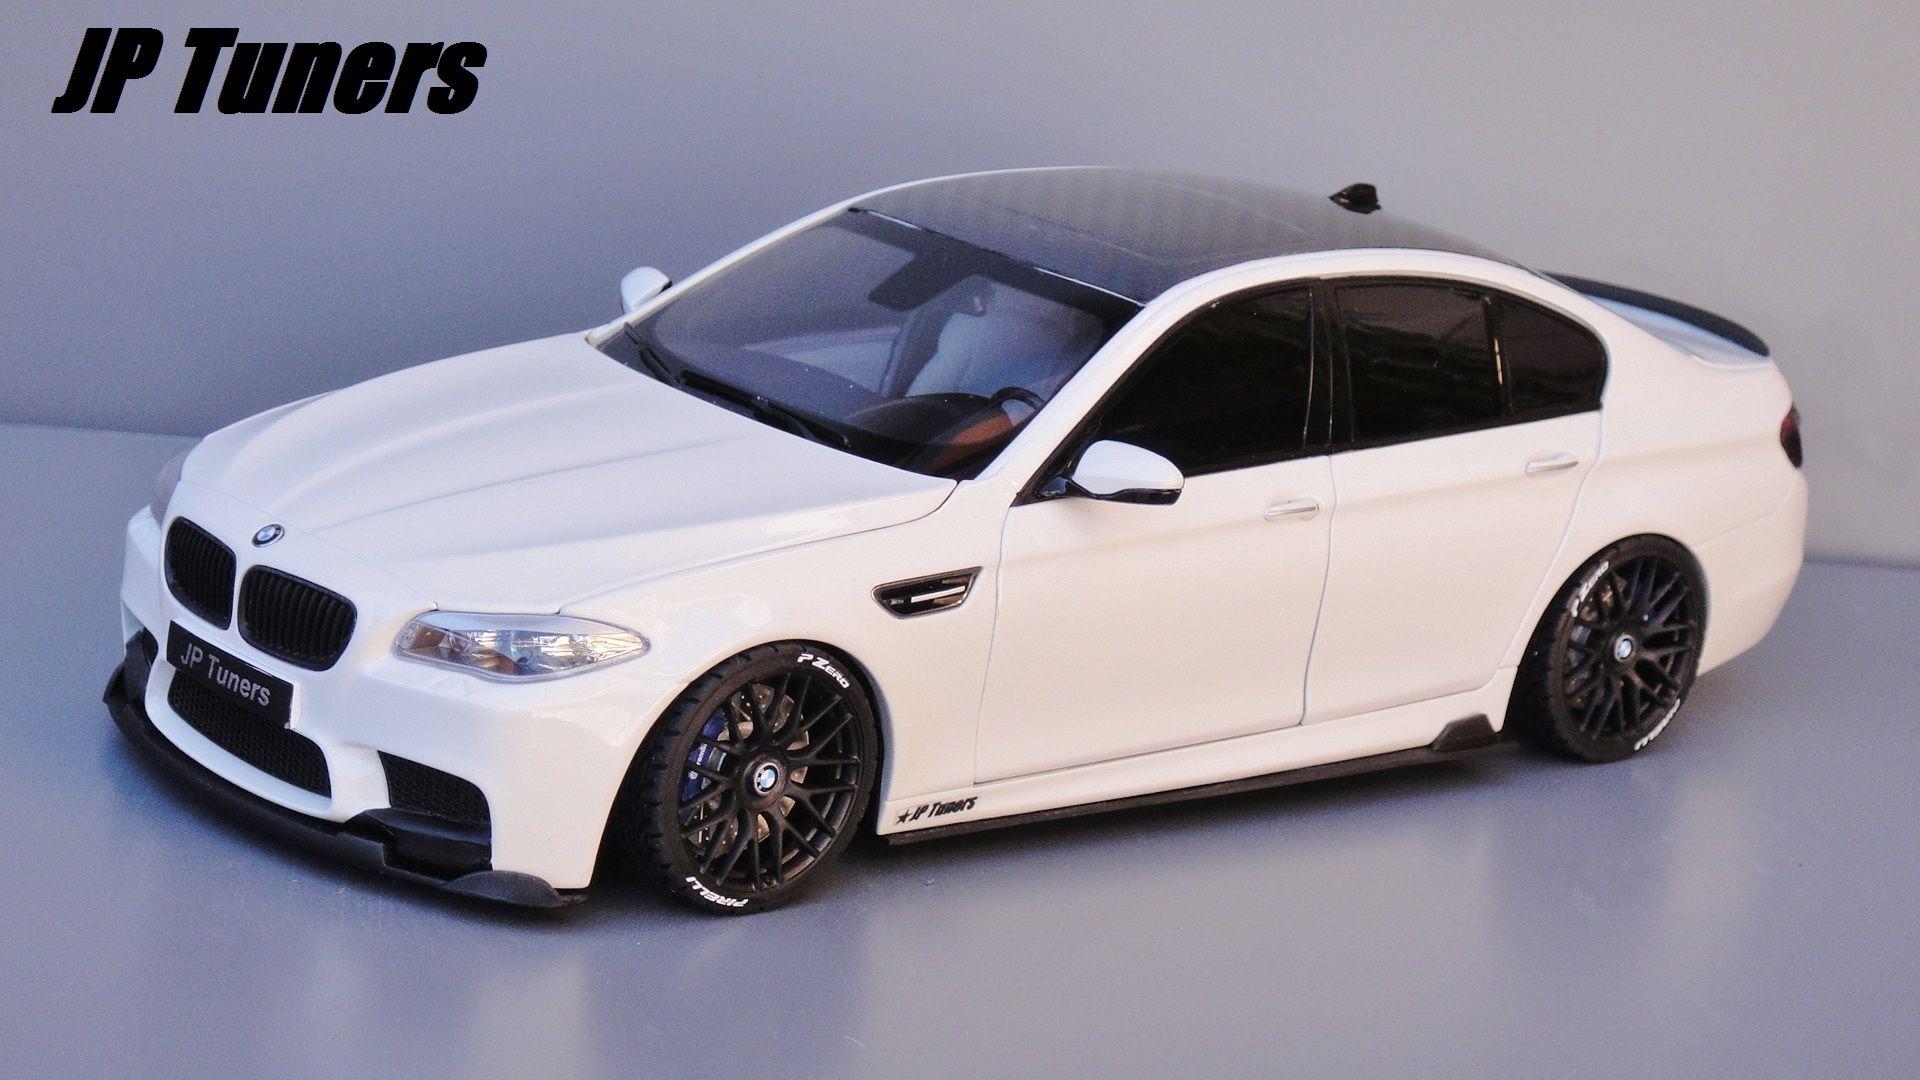 1:18 BMW M5 F10 TUNING JP Tuners | 1/18 Tuning JP Tuners